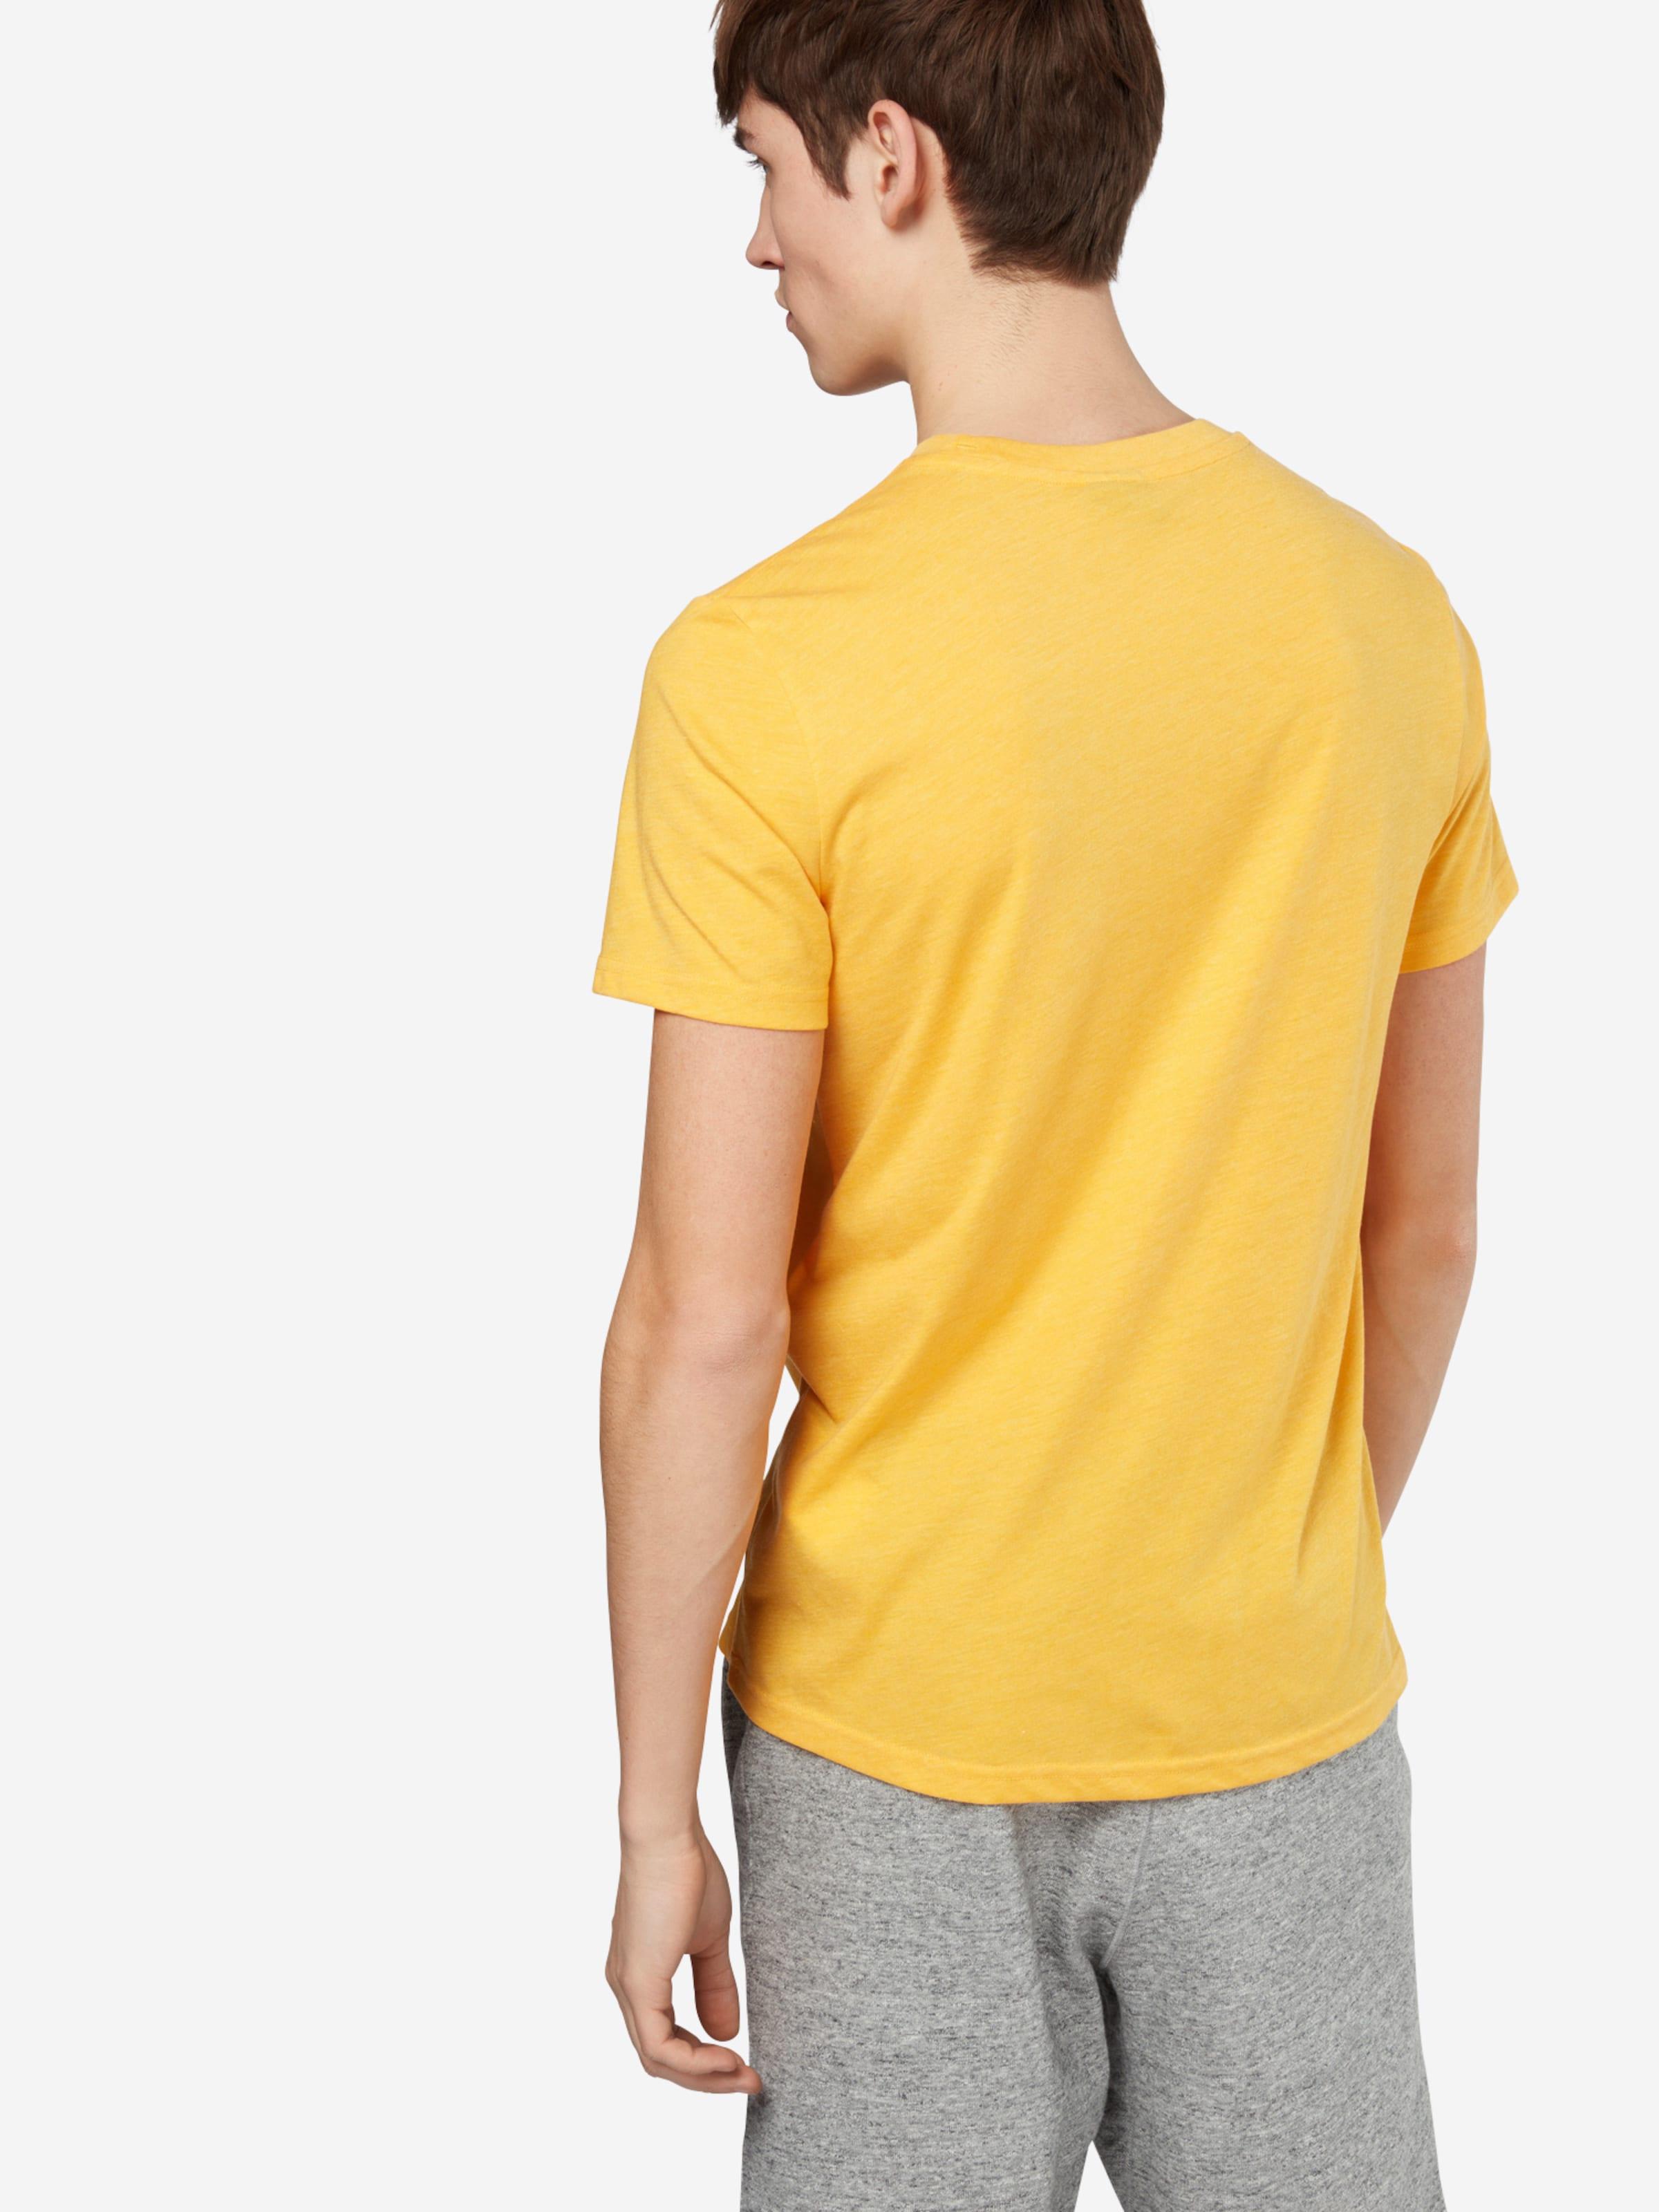 Champion Authentic Athletic Apparel T-Shirt mit Front-Print Niedriger Preis Versandgebühr pMJQldzK